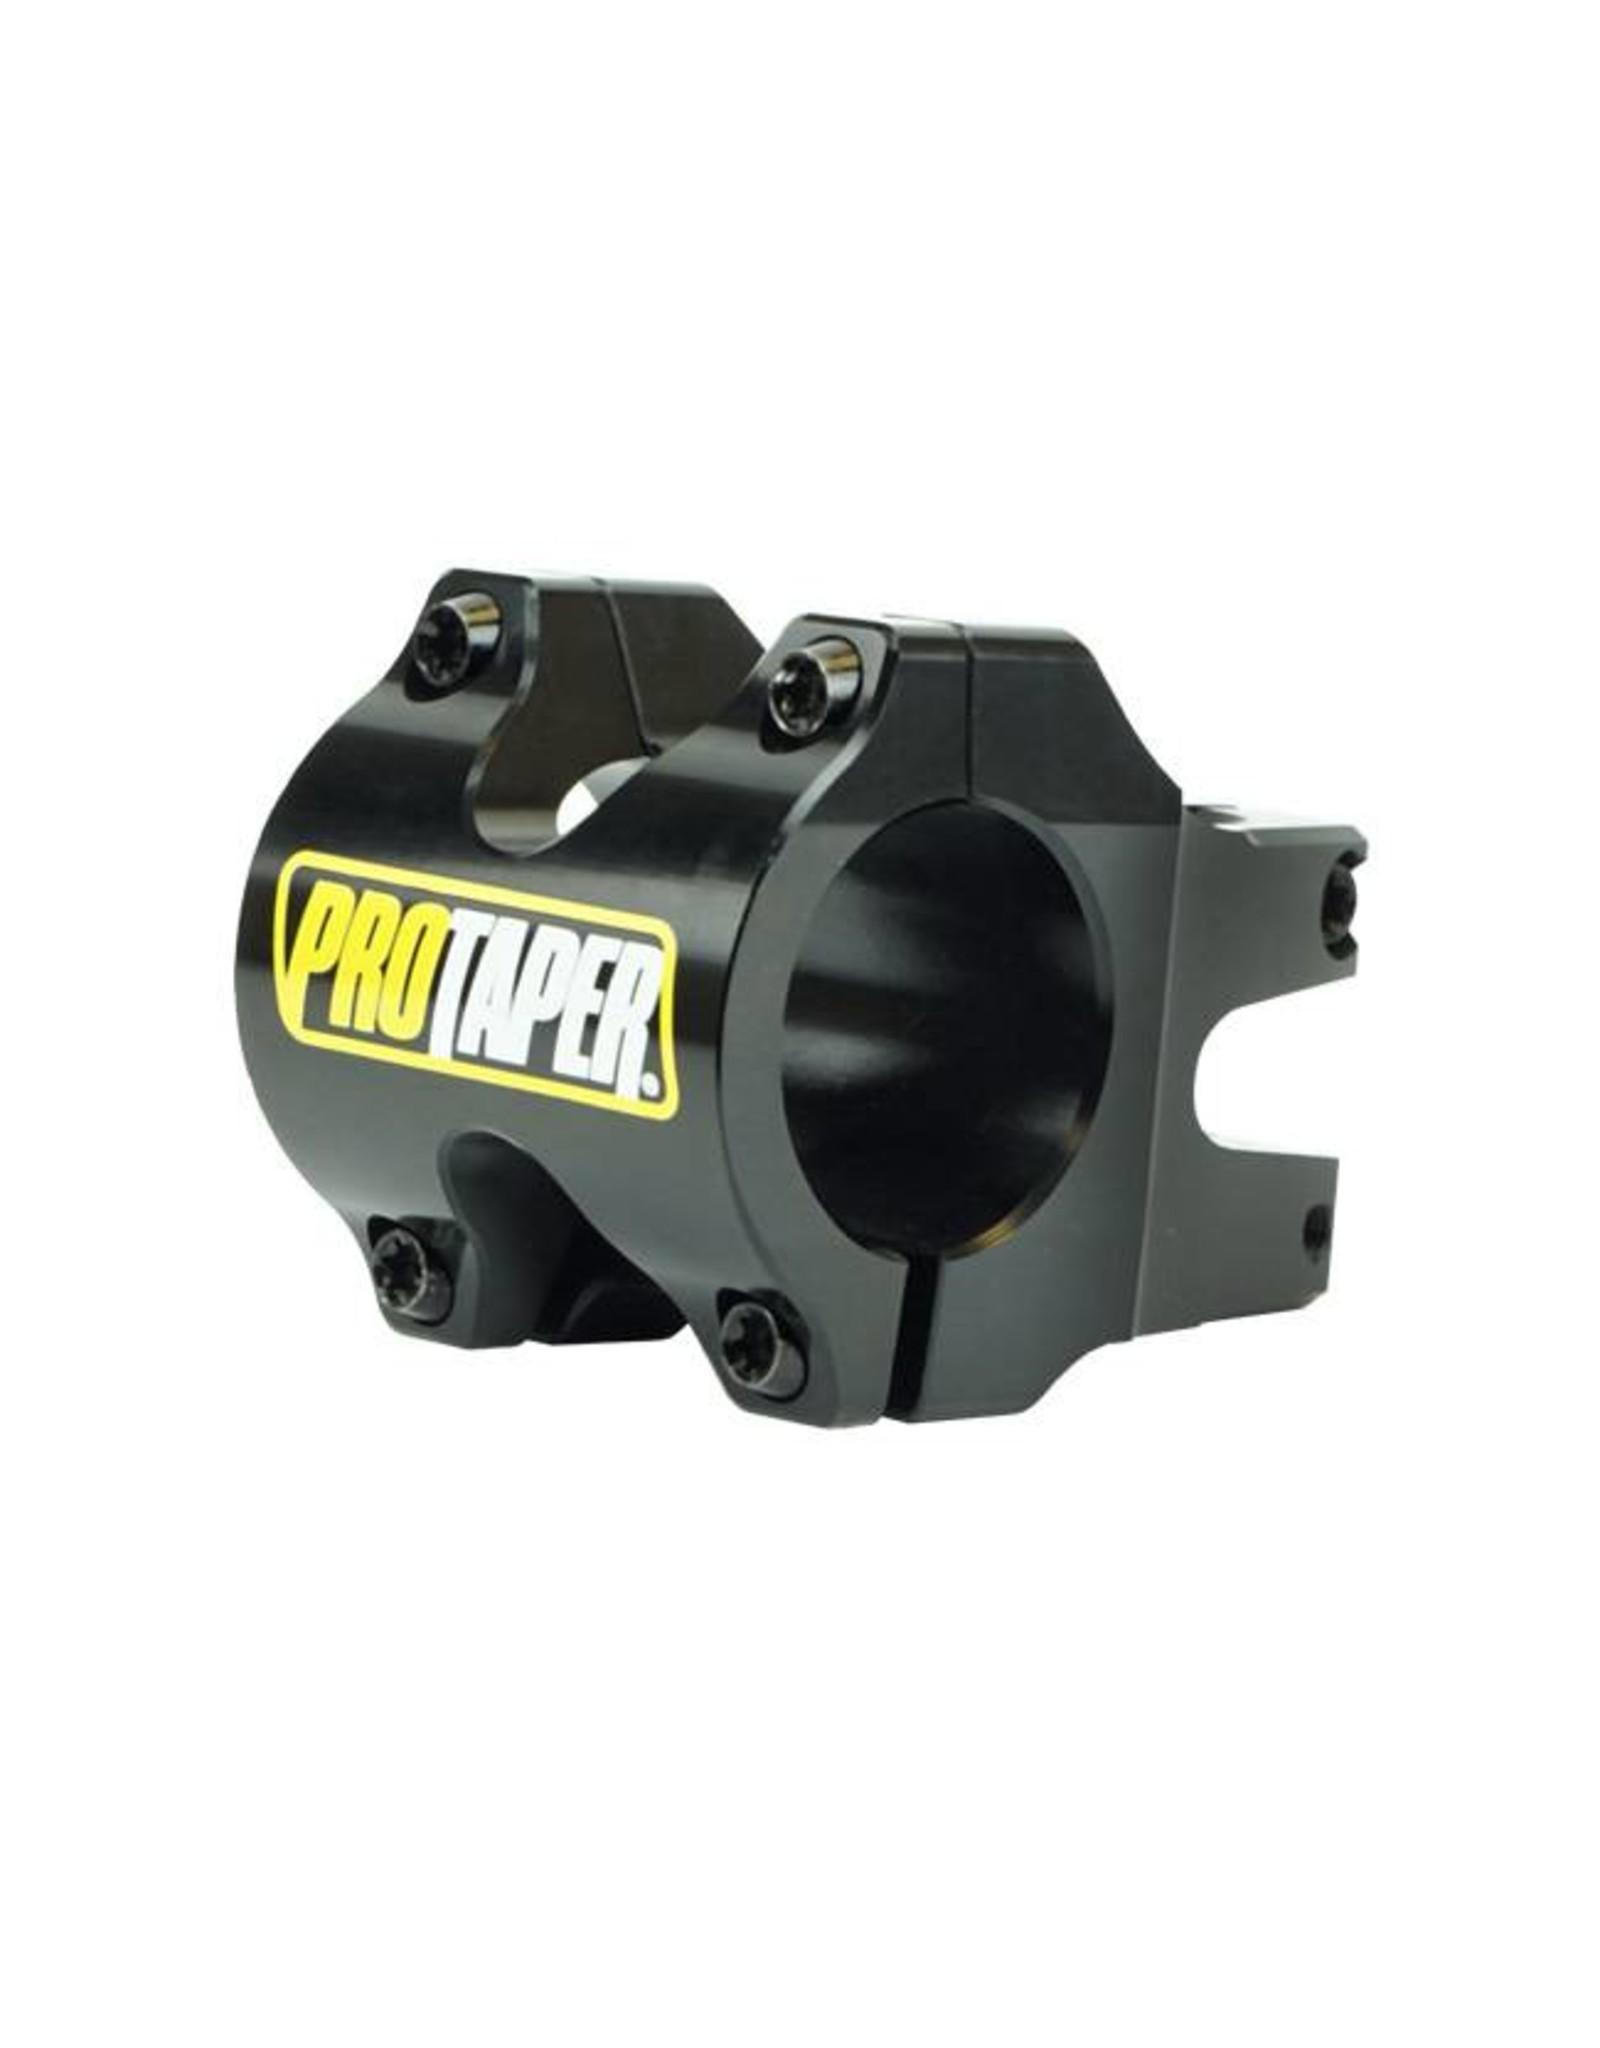 ProTaper ProTaper Stem, 30mm, 31.8mm Bar Clamp, Black